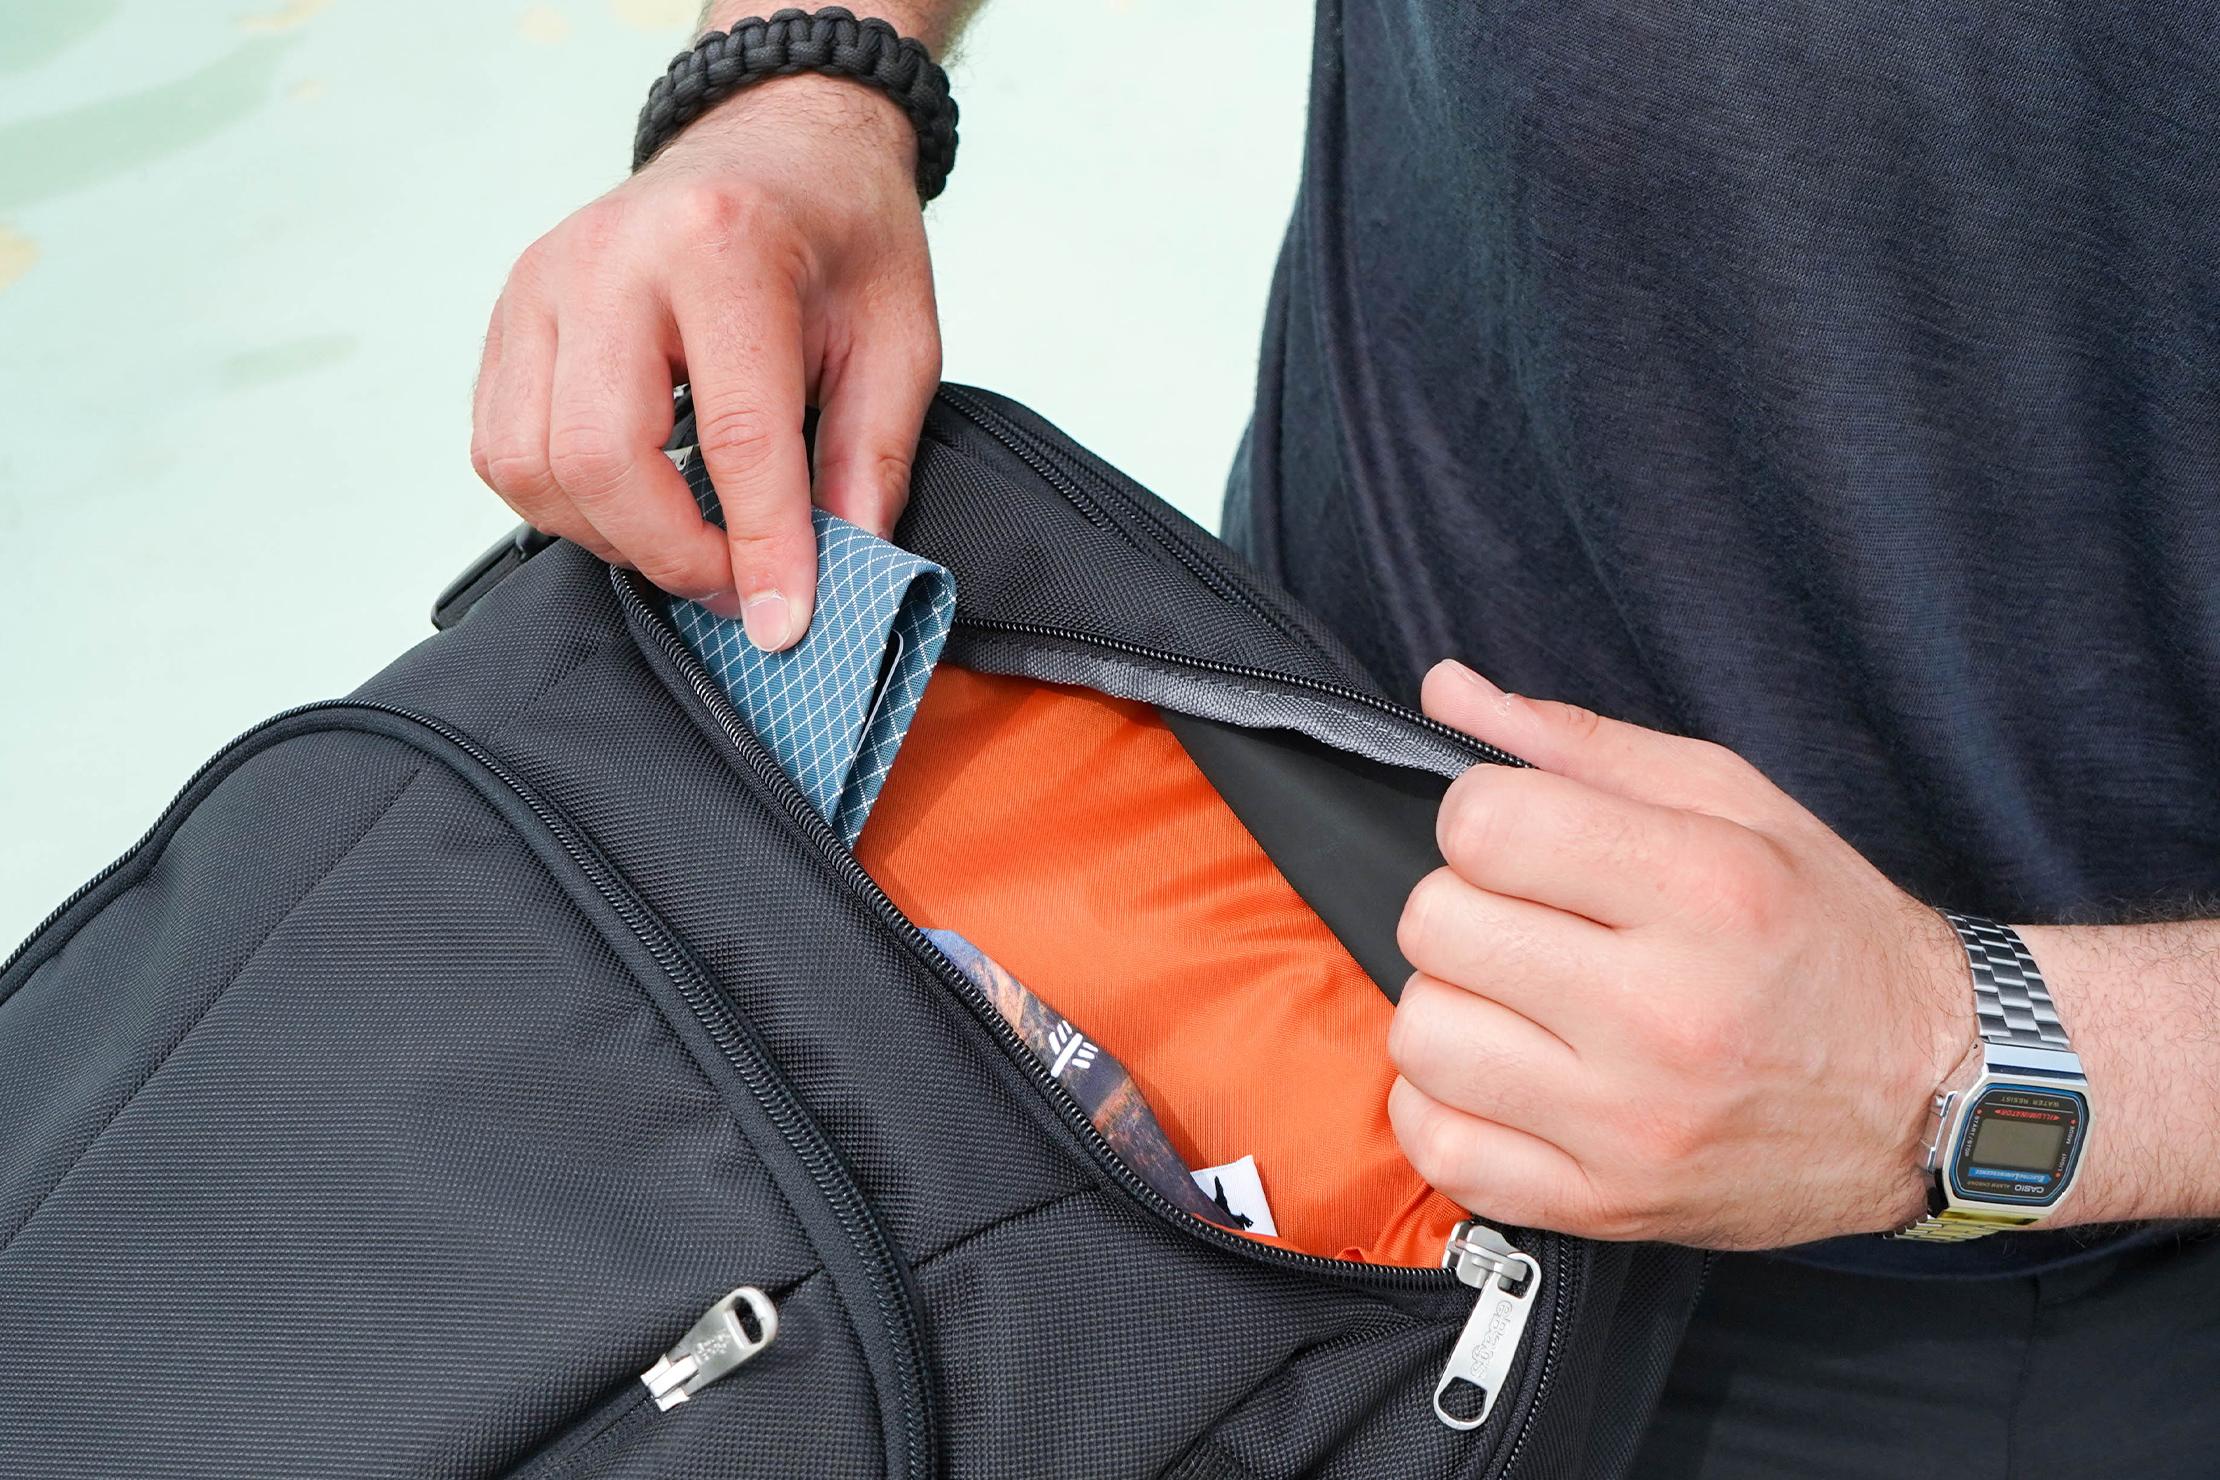 eBags TLS Mother Lode Weekender Convertible Quickgrab Pocket